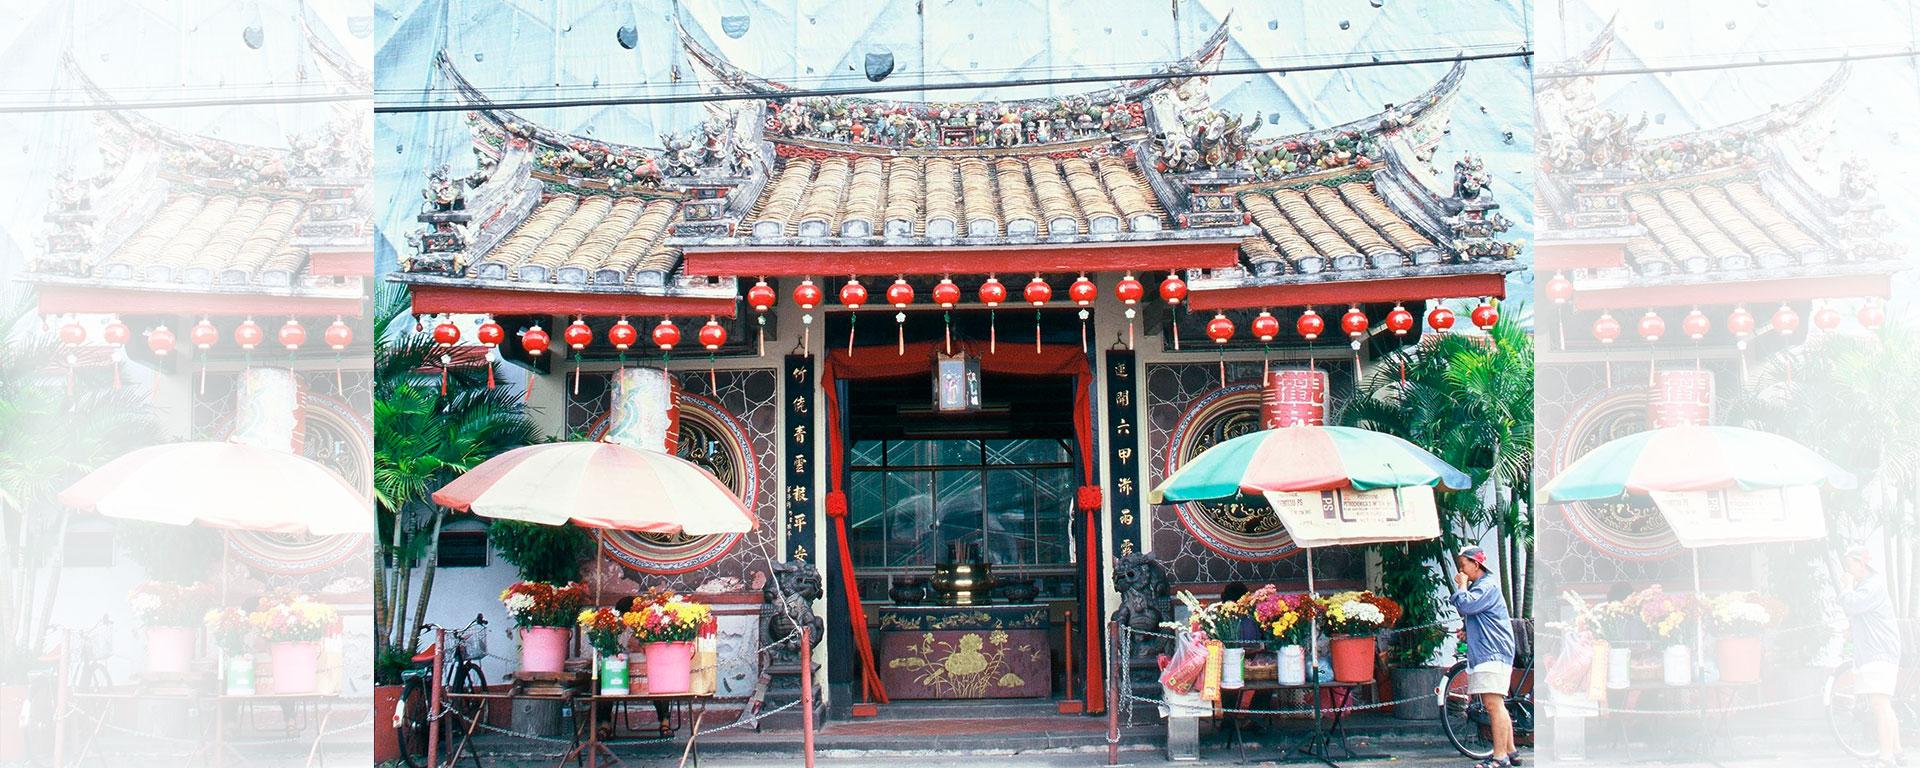 Cheng Hoon Teng Temple Key Image